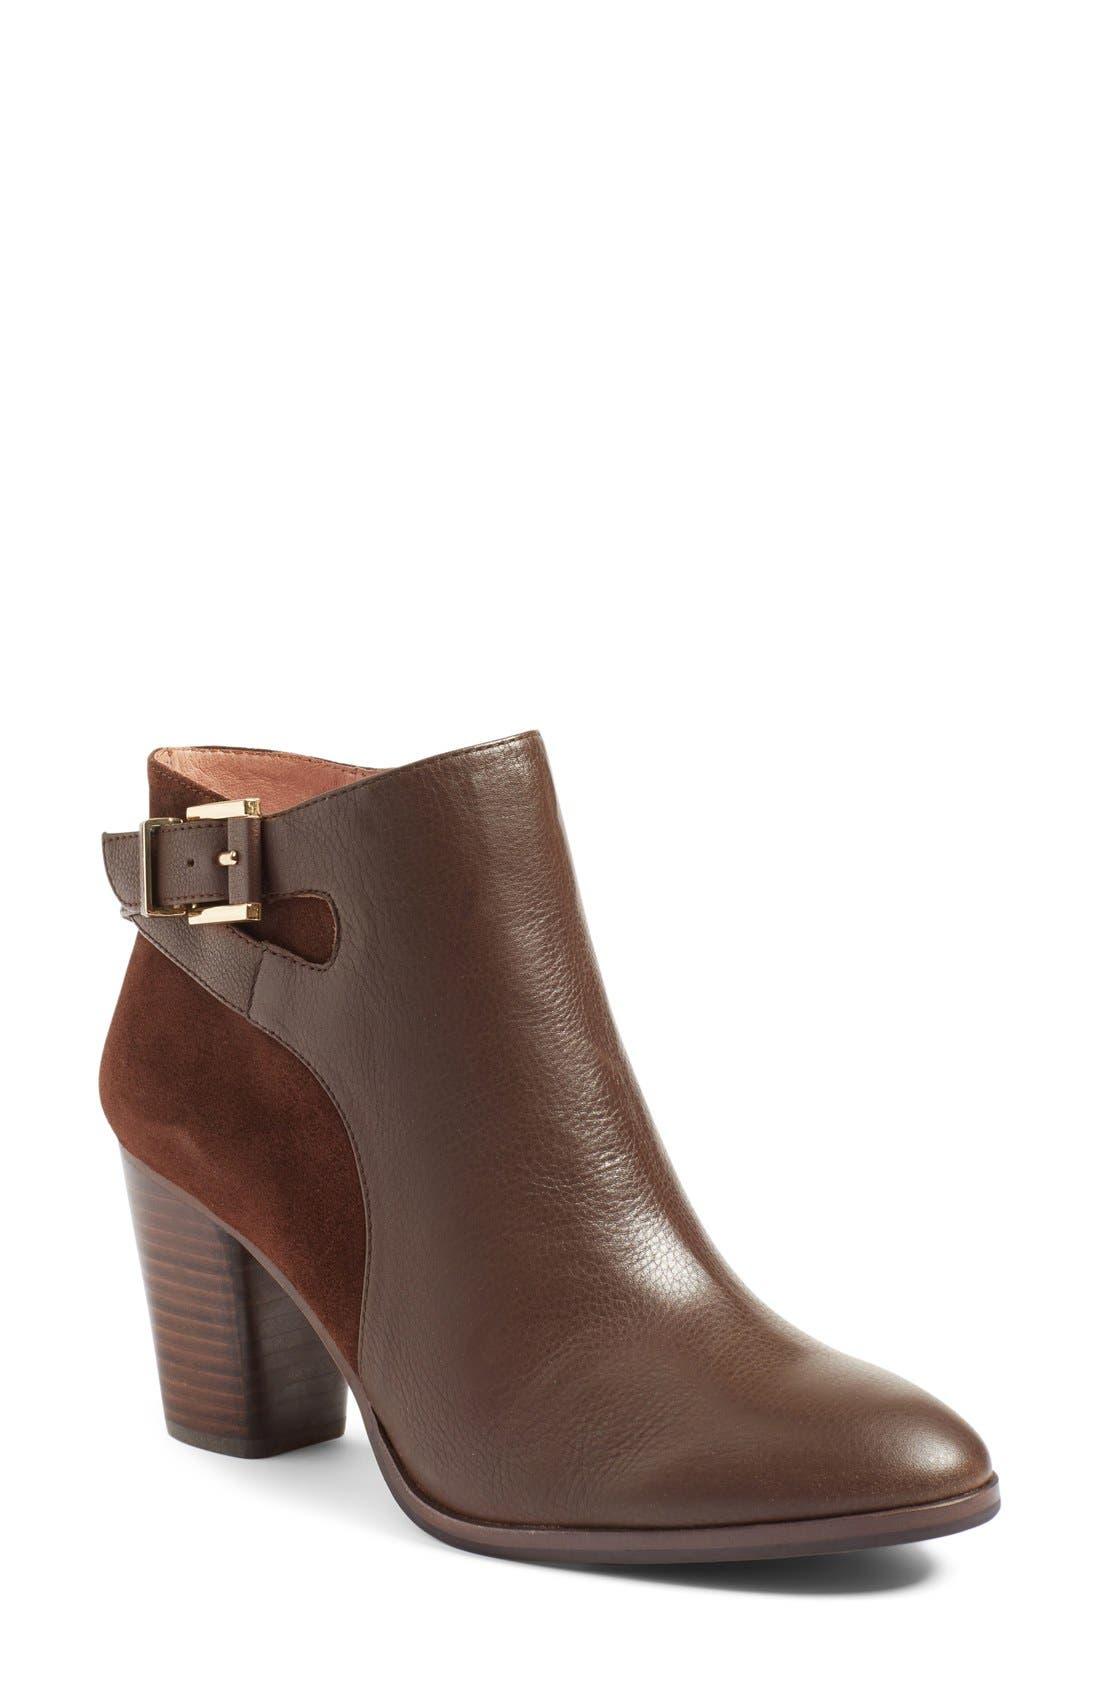 Main Image - Louise et Cie 'Vasca' Almond Toe Bootie (Women) (Nordstrom Exclusive)